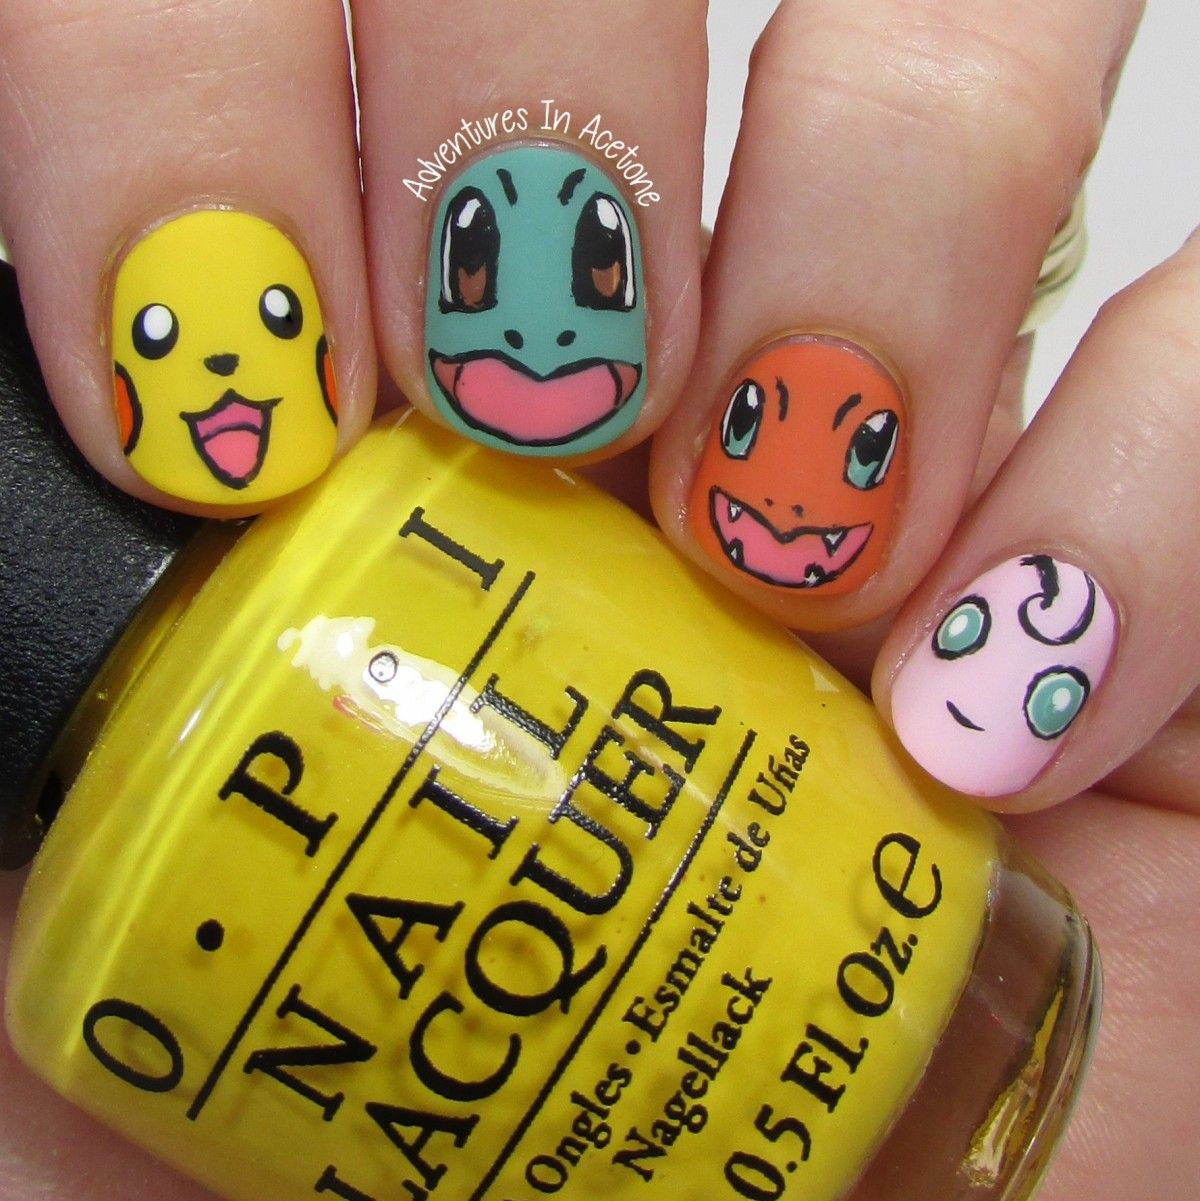 Pokemon Nail Art 2 - Pokemon Nail Art 2 Nail Ideas Nail Art, Nails, Nail Art Designs